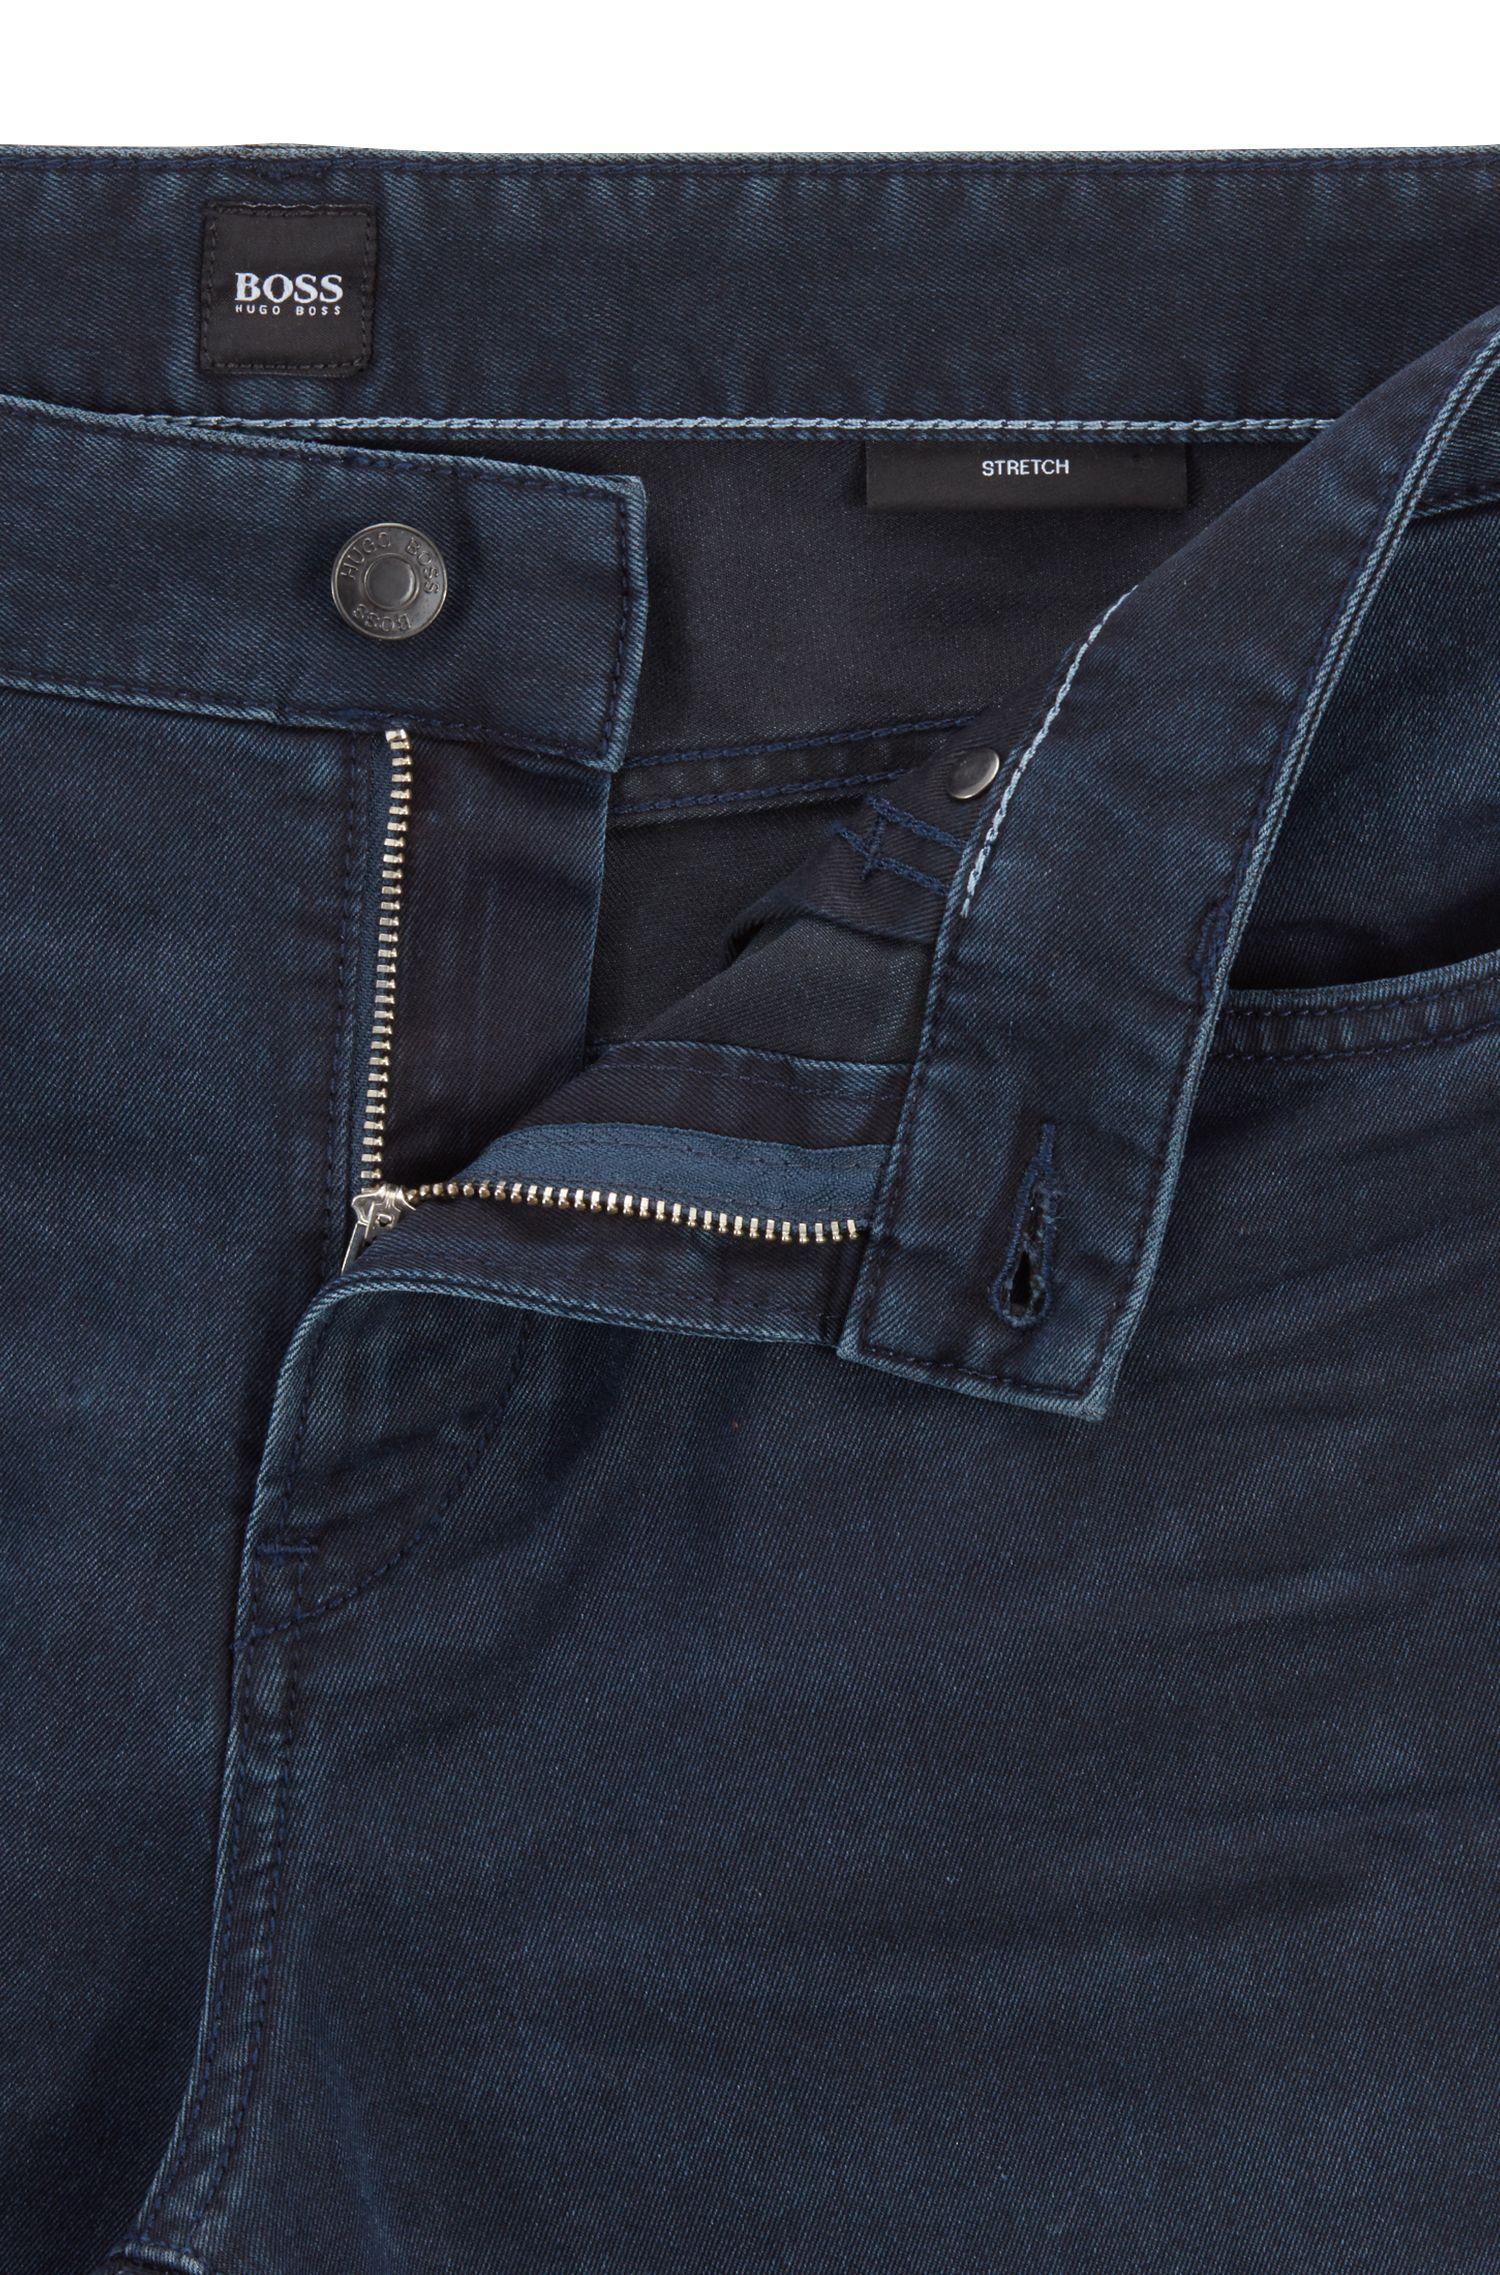 Slim-Fit Jeans aus italienischem Denim, Dunkelblau